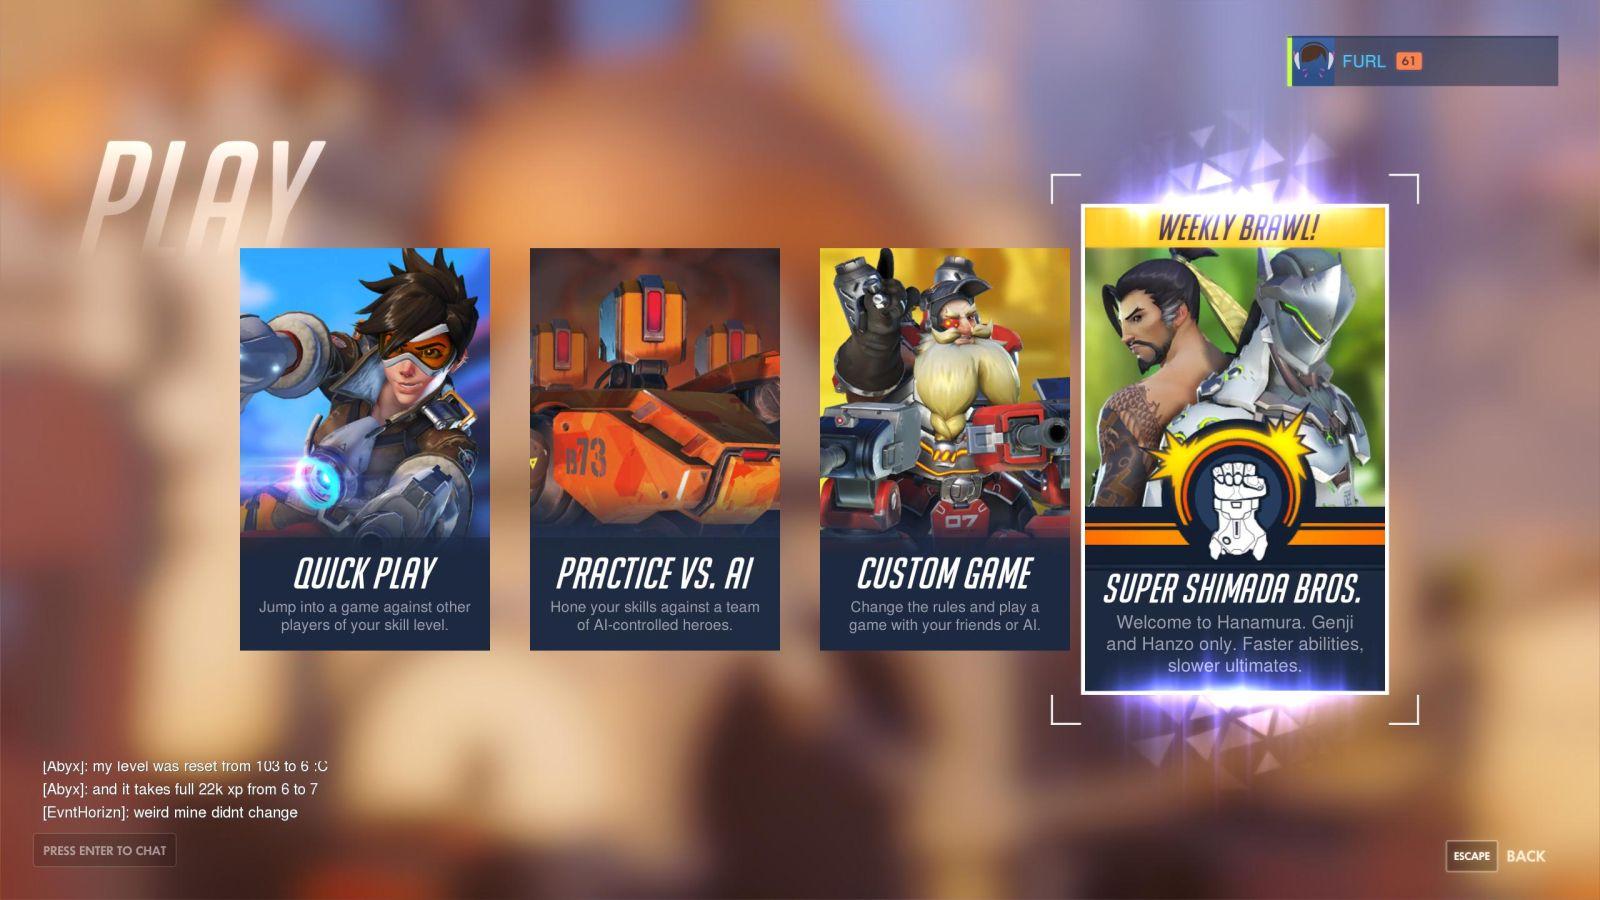 overwatch-game-modes-blizzcon-blizzard-esports-brawl-all-brawls-arcade-mode